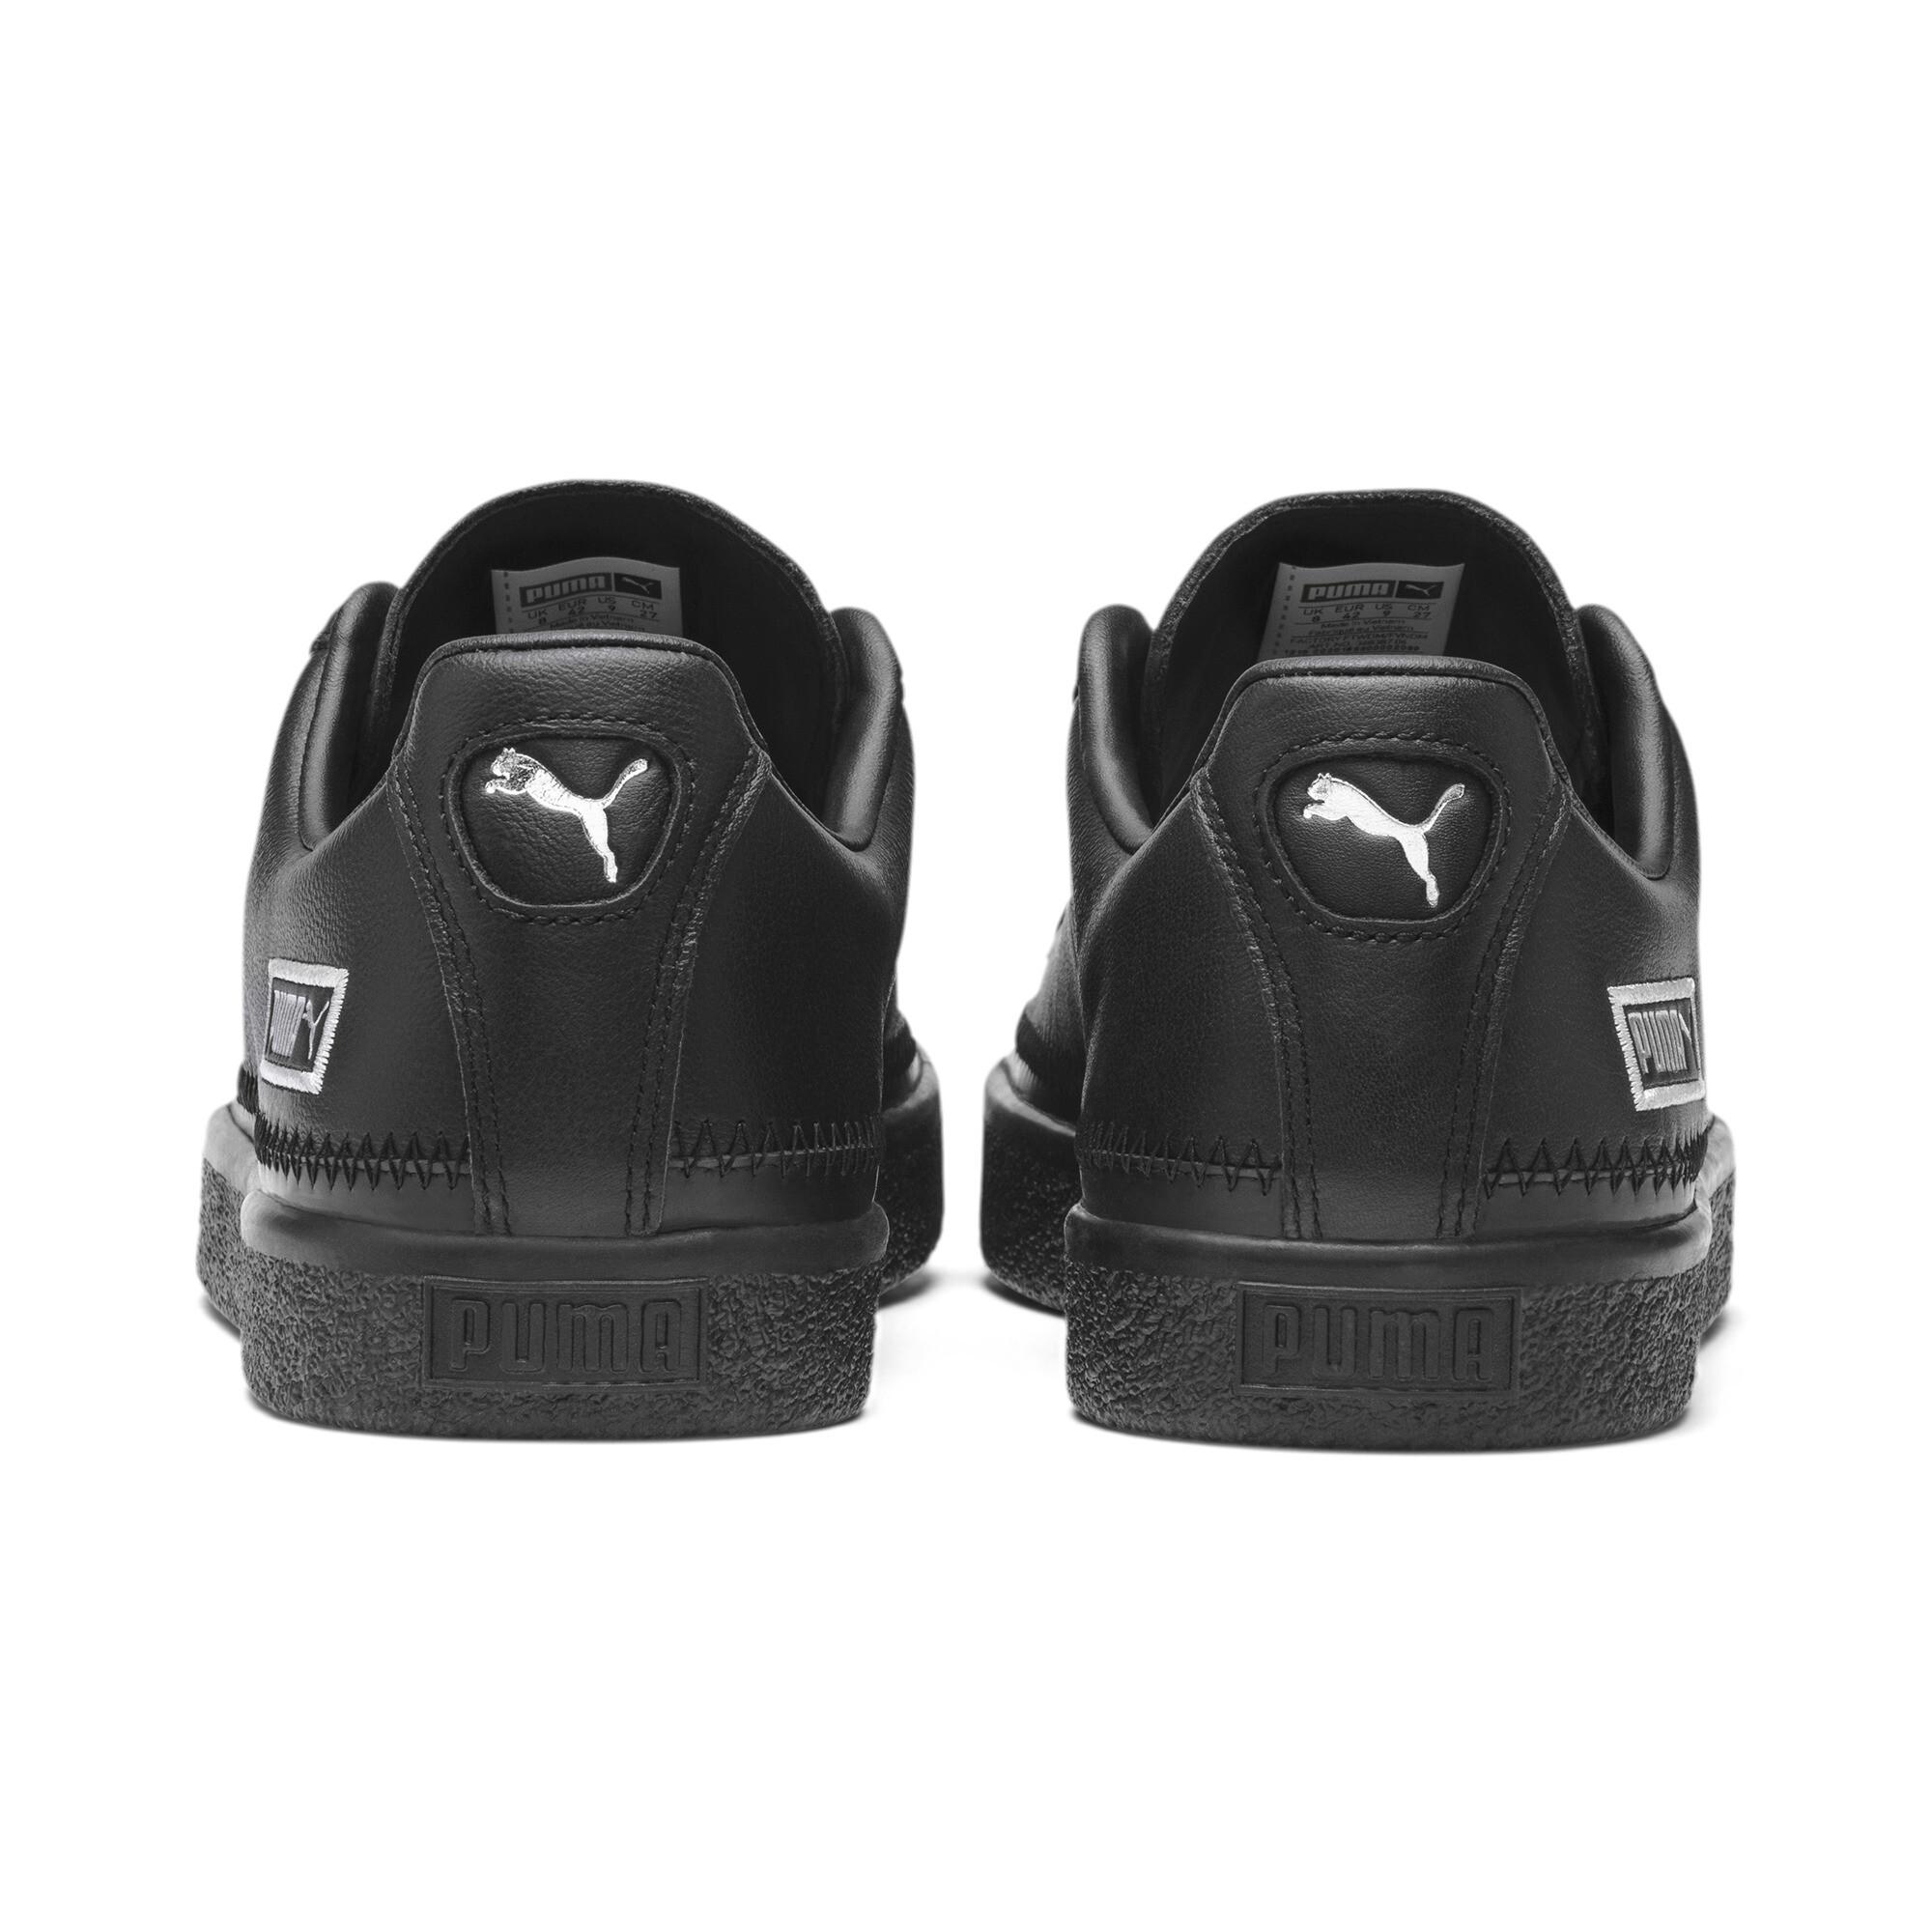 Indexbild 15 - PUMA Basket Stitch Sneaker Unisex Schuhe Neu